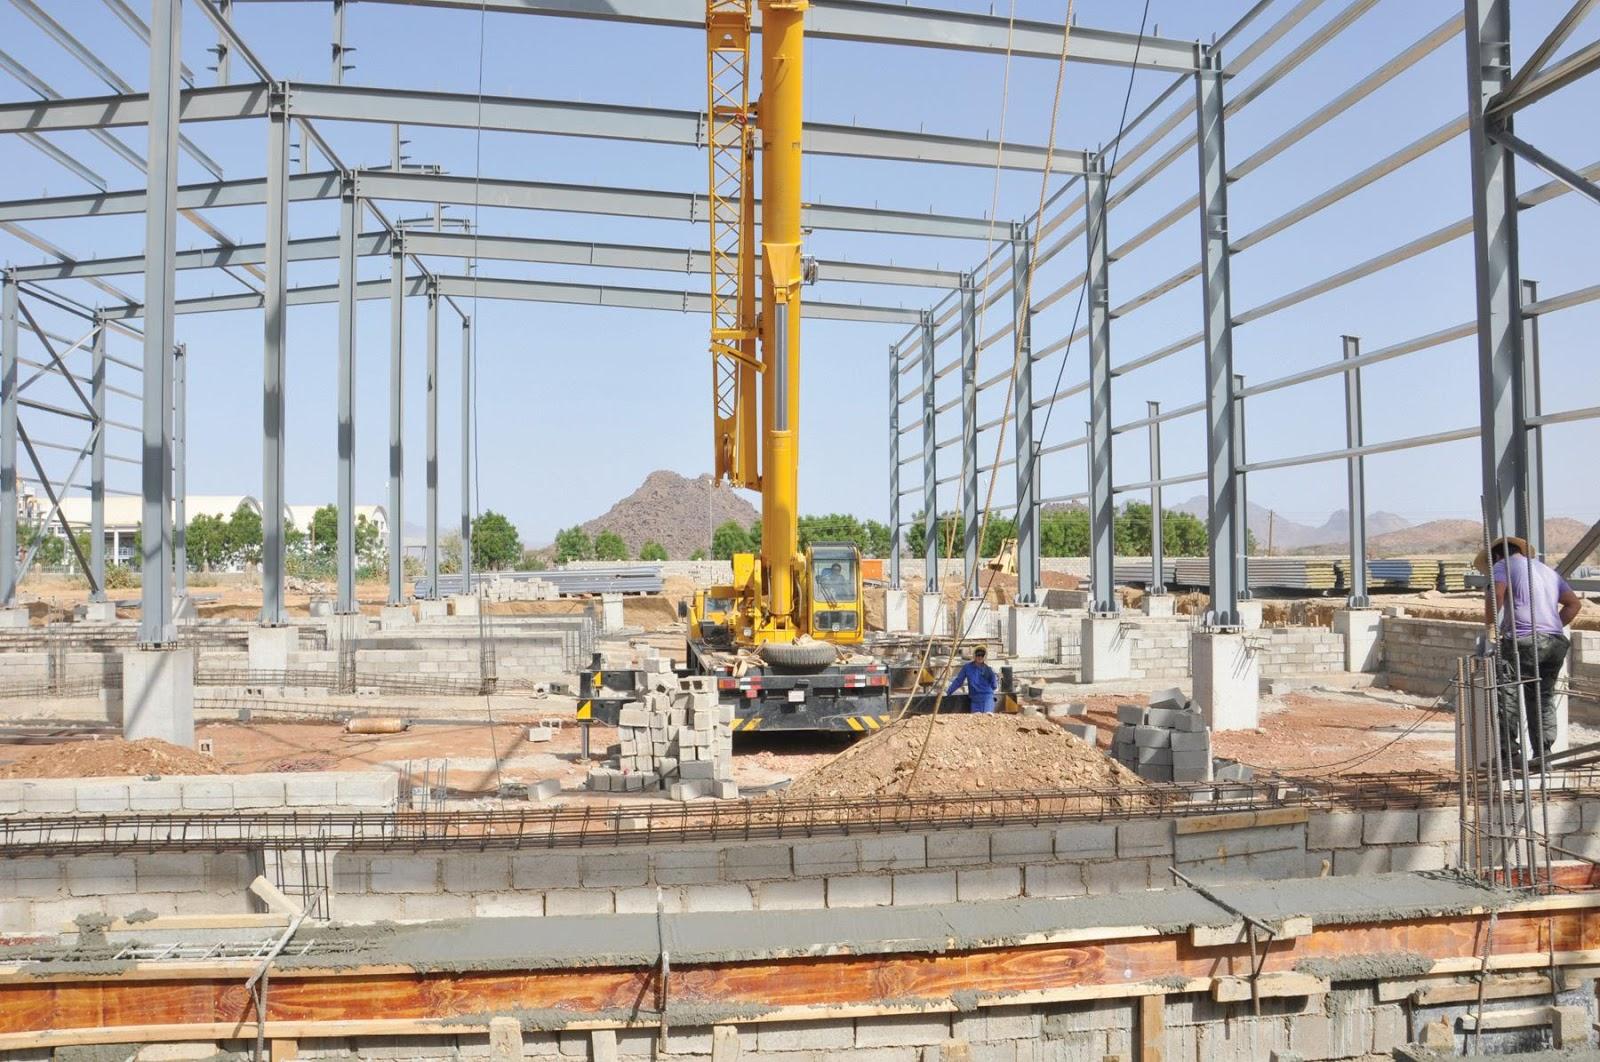 Construction of Cold Storage - Eritrea